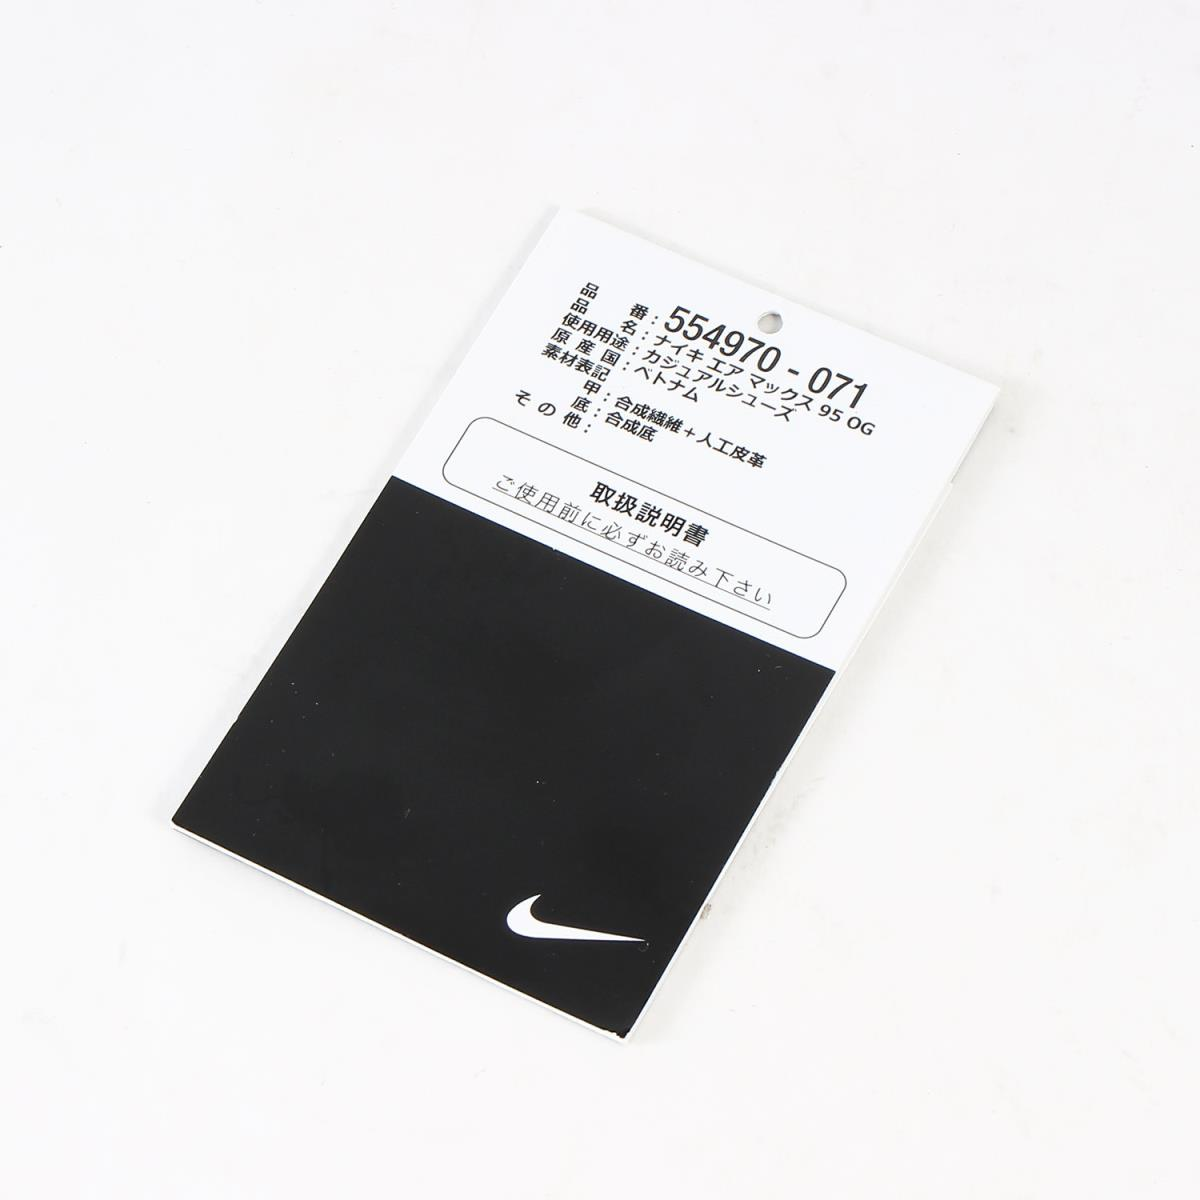 NIKE (Nike) AIR MAX 95 OG VOLT NEON ( 554,970 071 made in 2018) black X bolt US10.5(28.5cm)